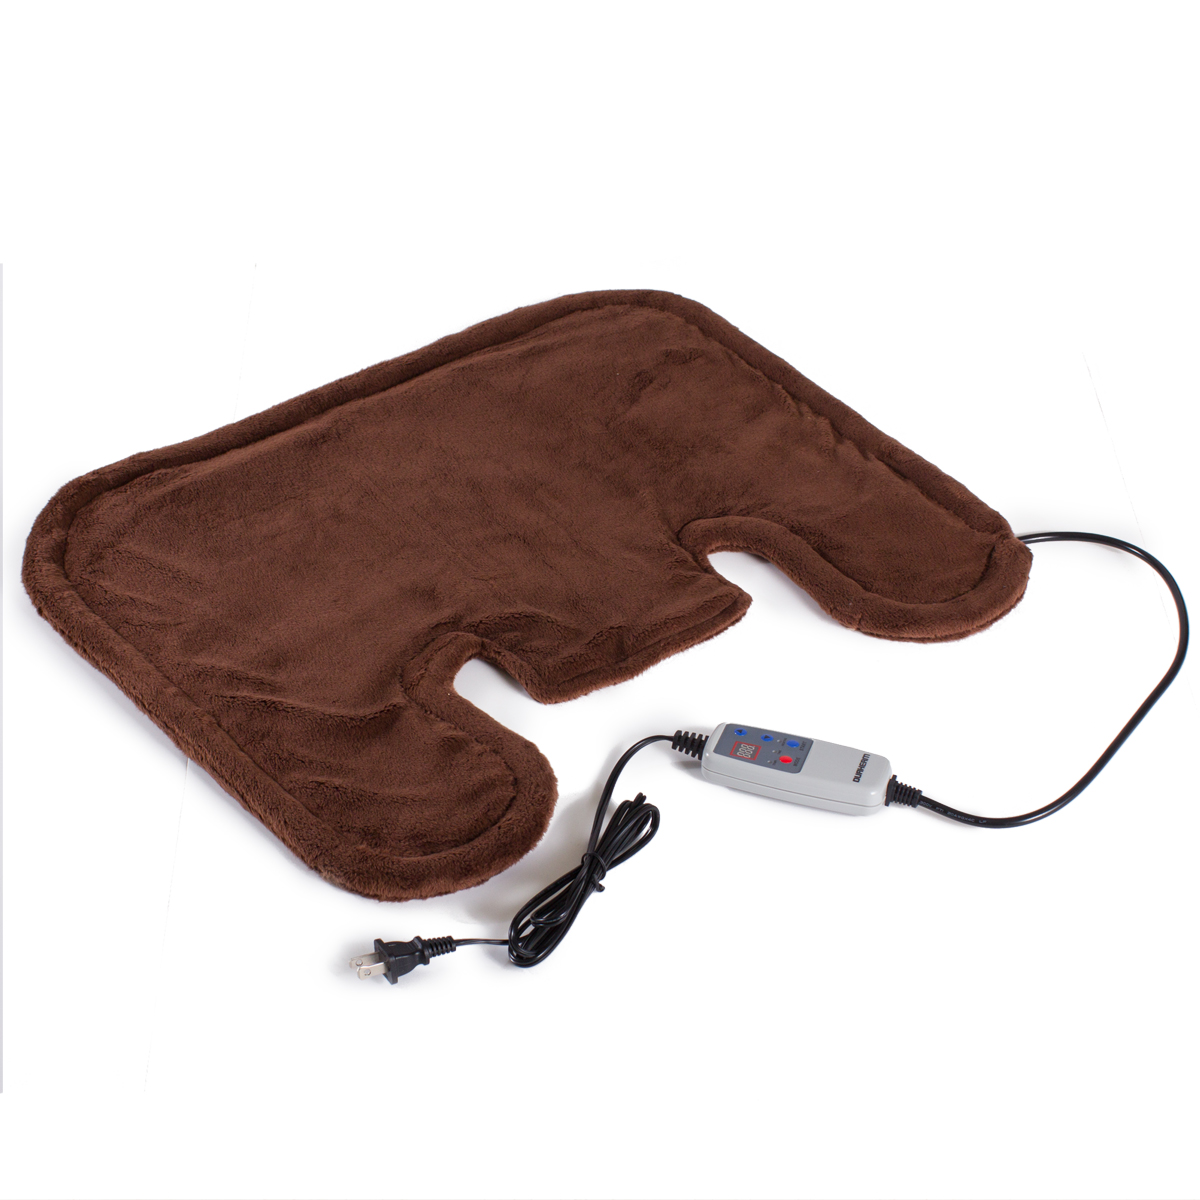 Durherm DISP-404 Far Infrared FIR Shoulder Neck Wrap Heating Therapy Pad - Brown